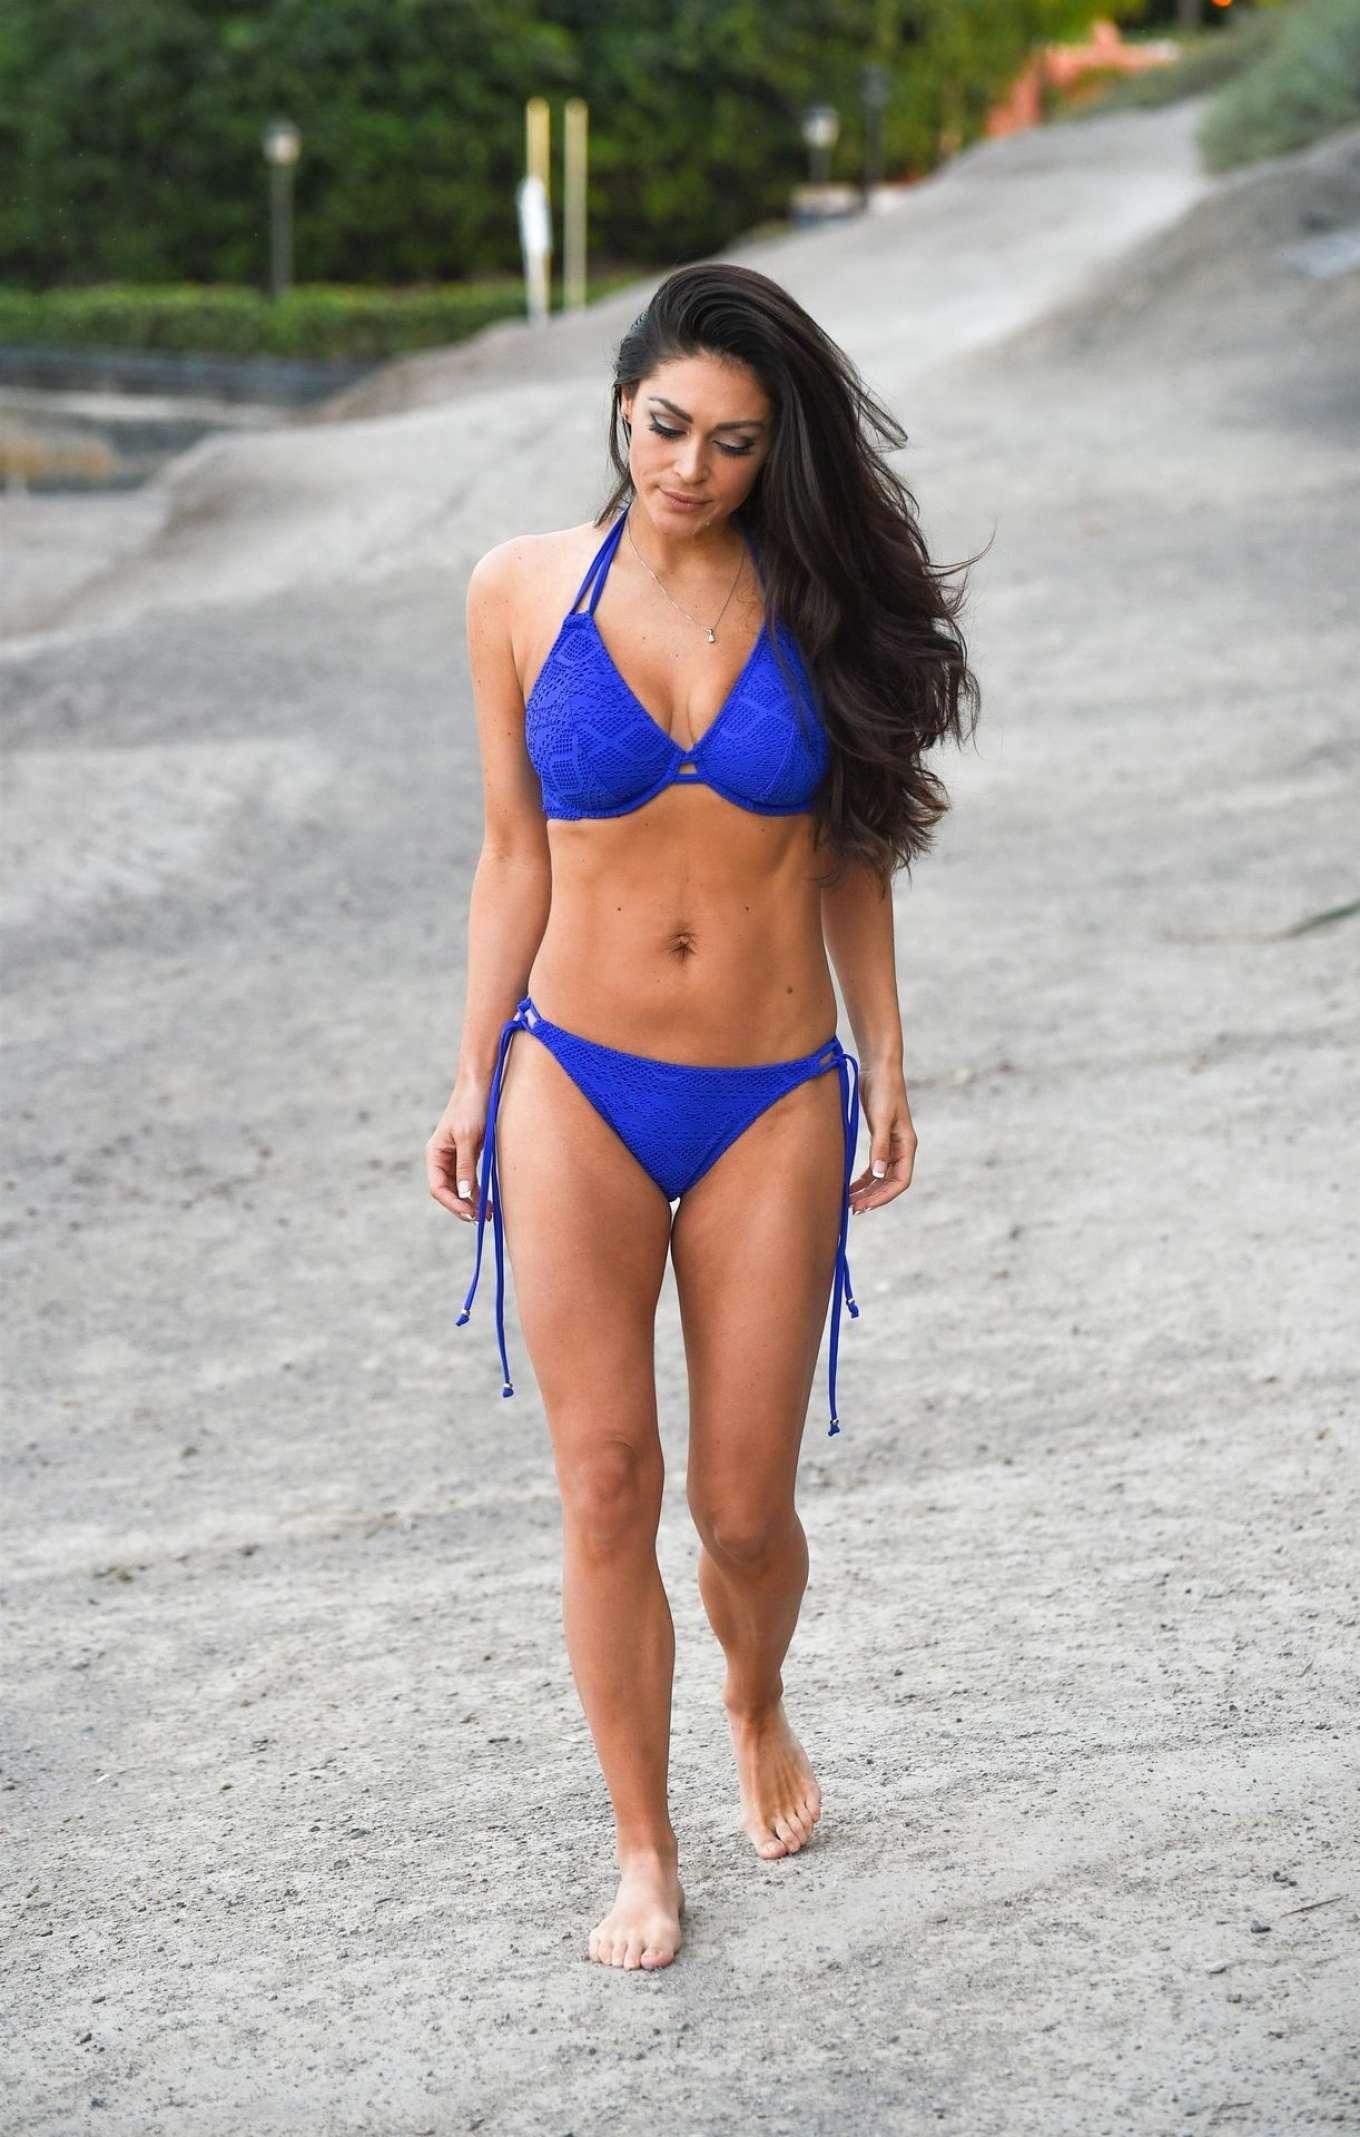 Casey Batchelor in Blue Bikini - Filming for her yoga blitz app in Tenerife